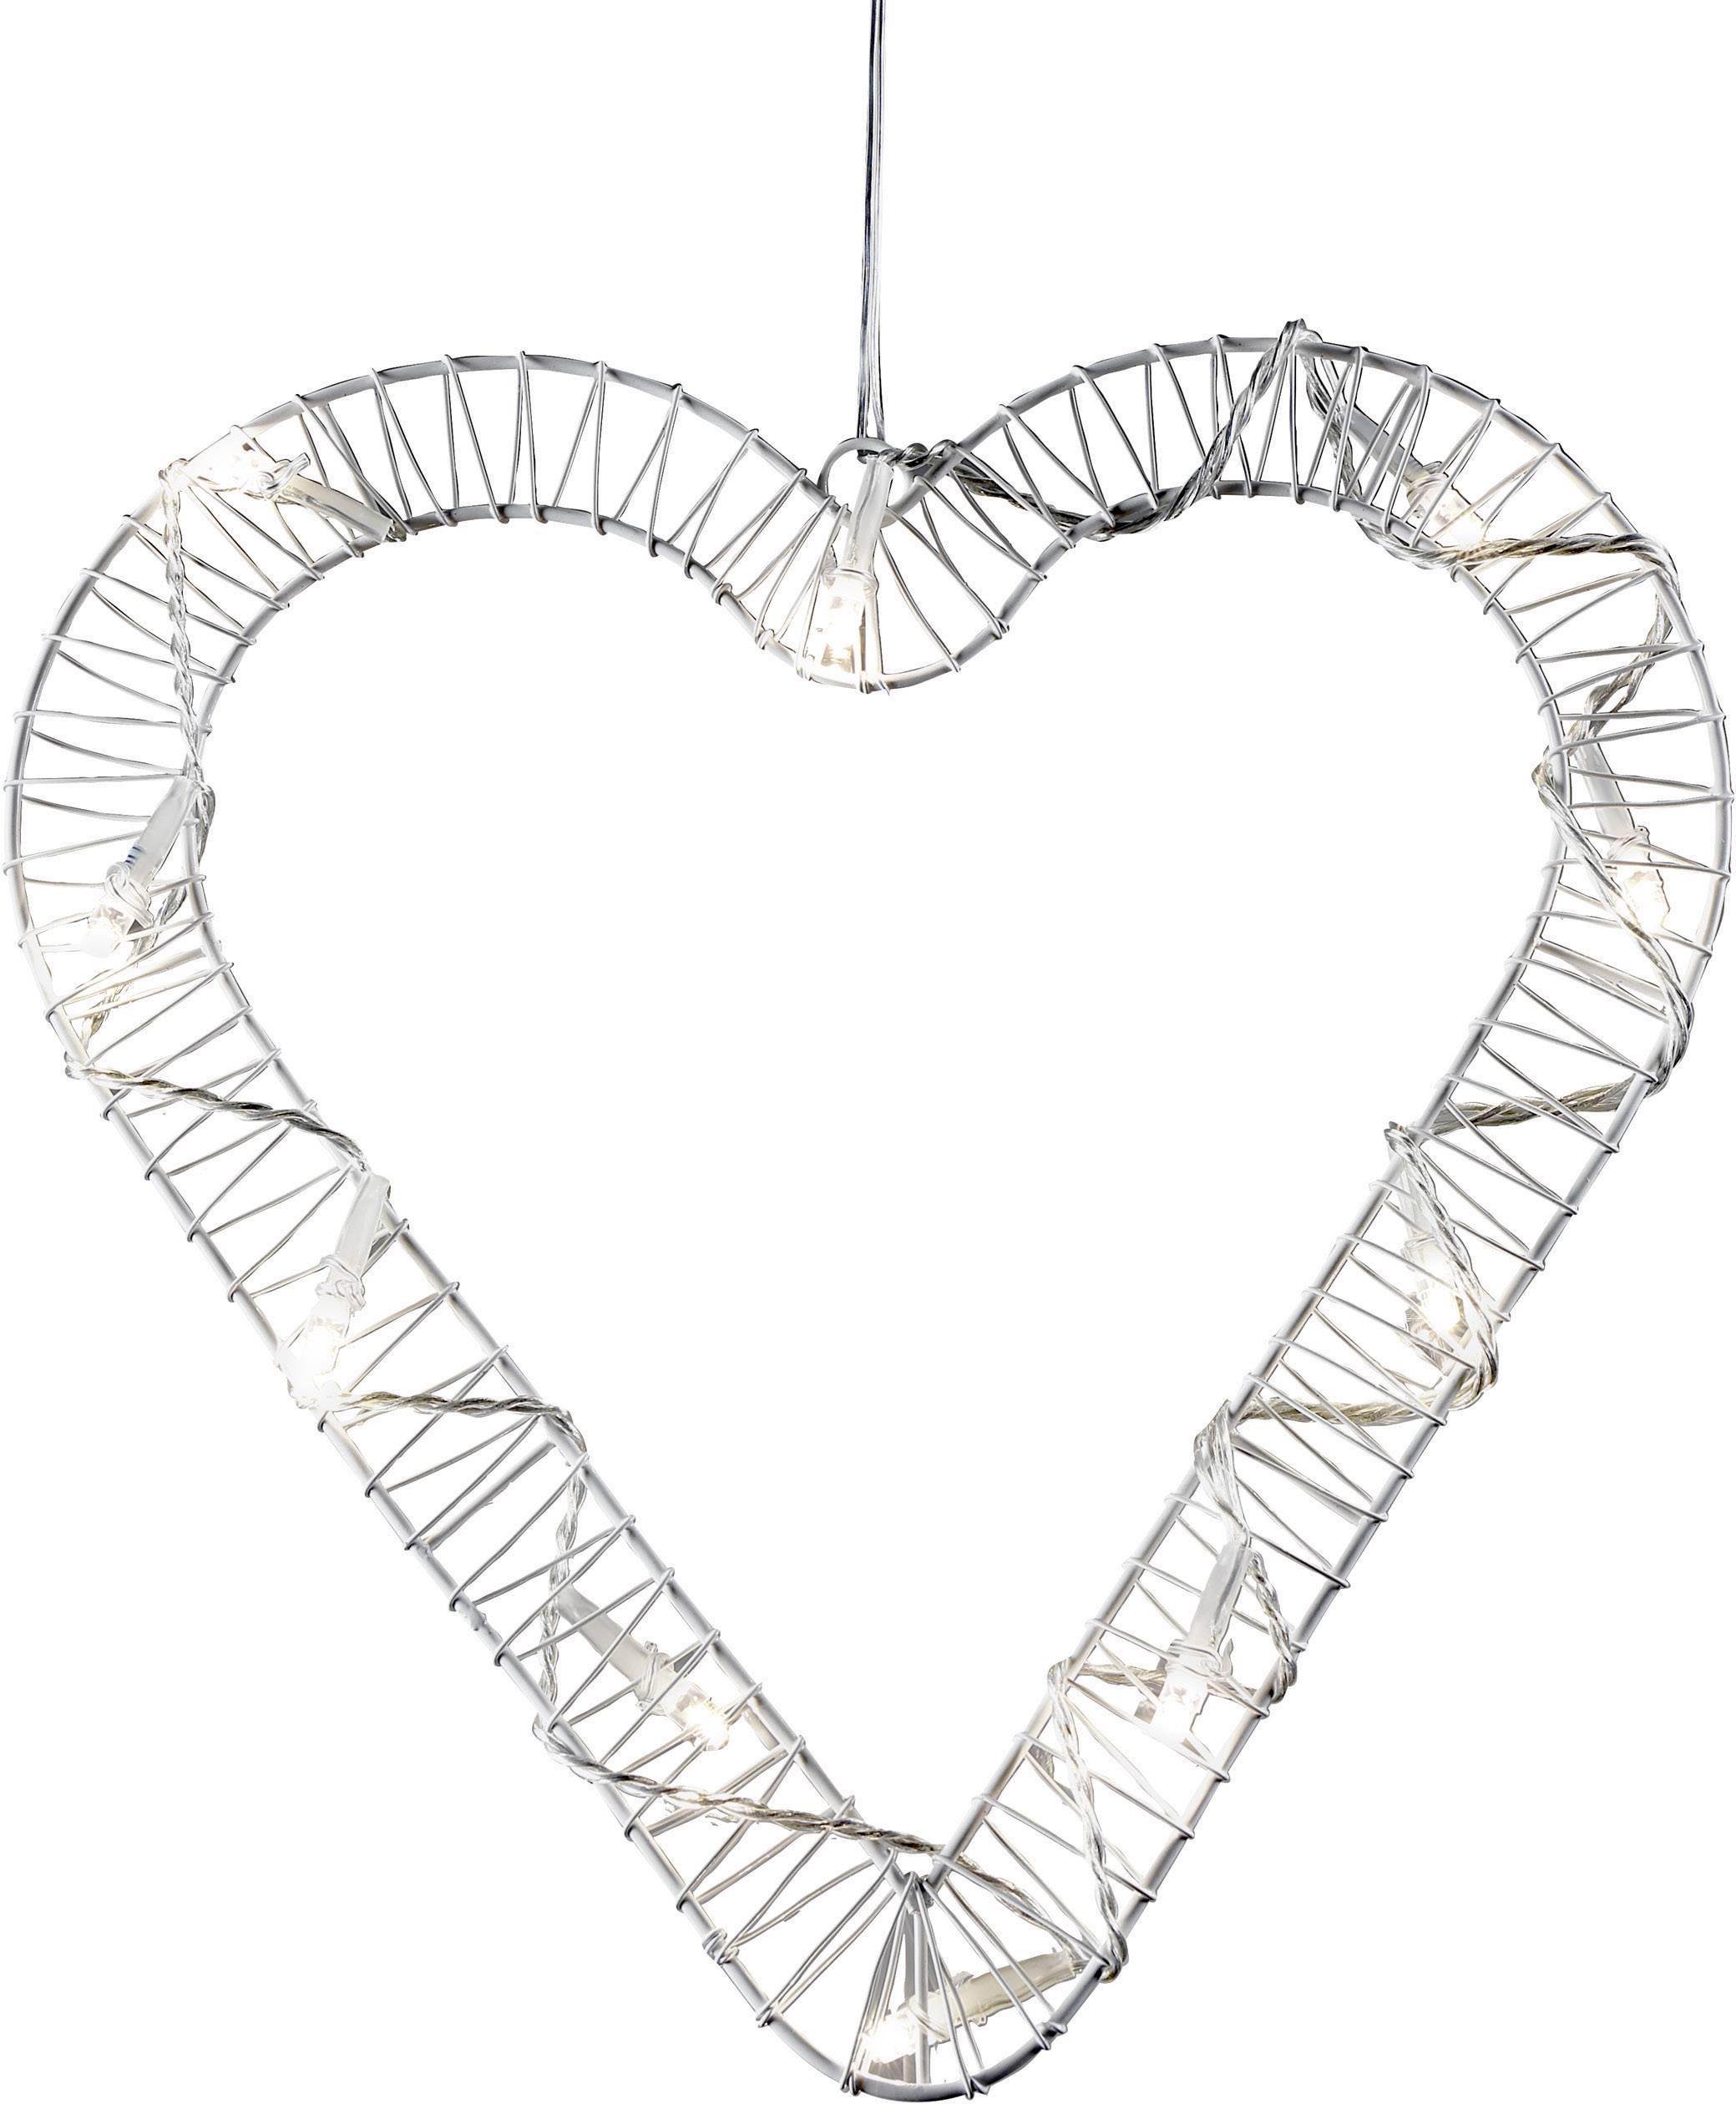 LED srdce ozdoba do okna Polarlite 709660, biela